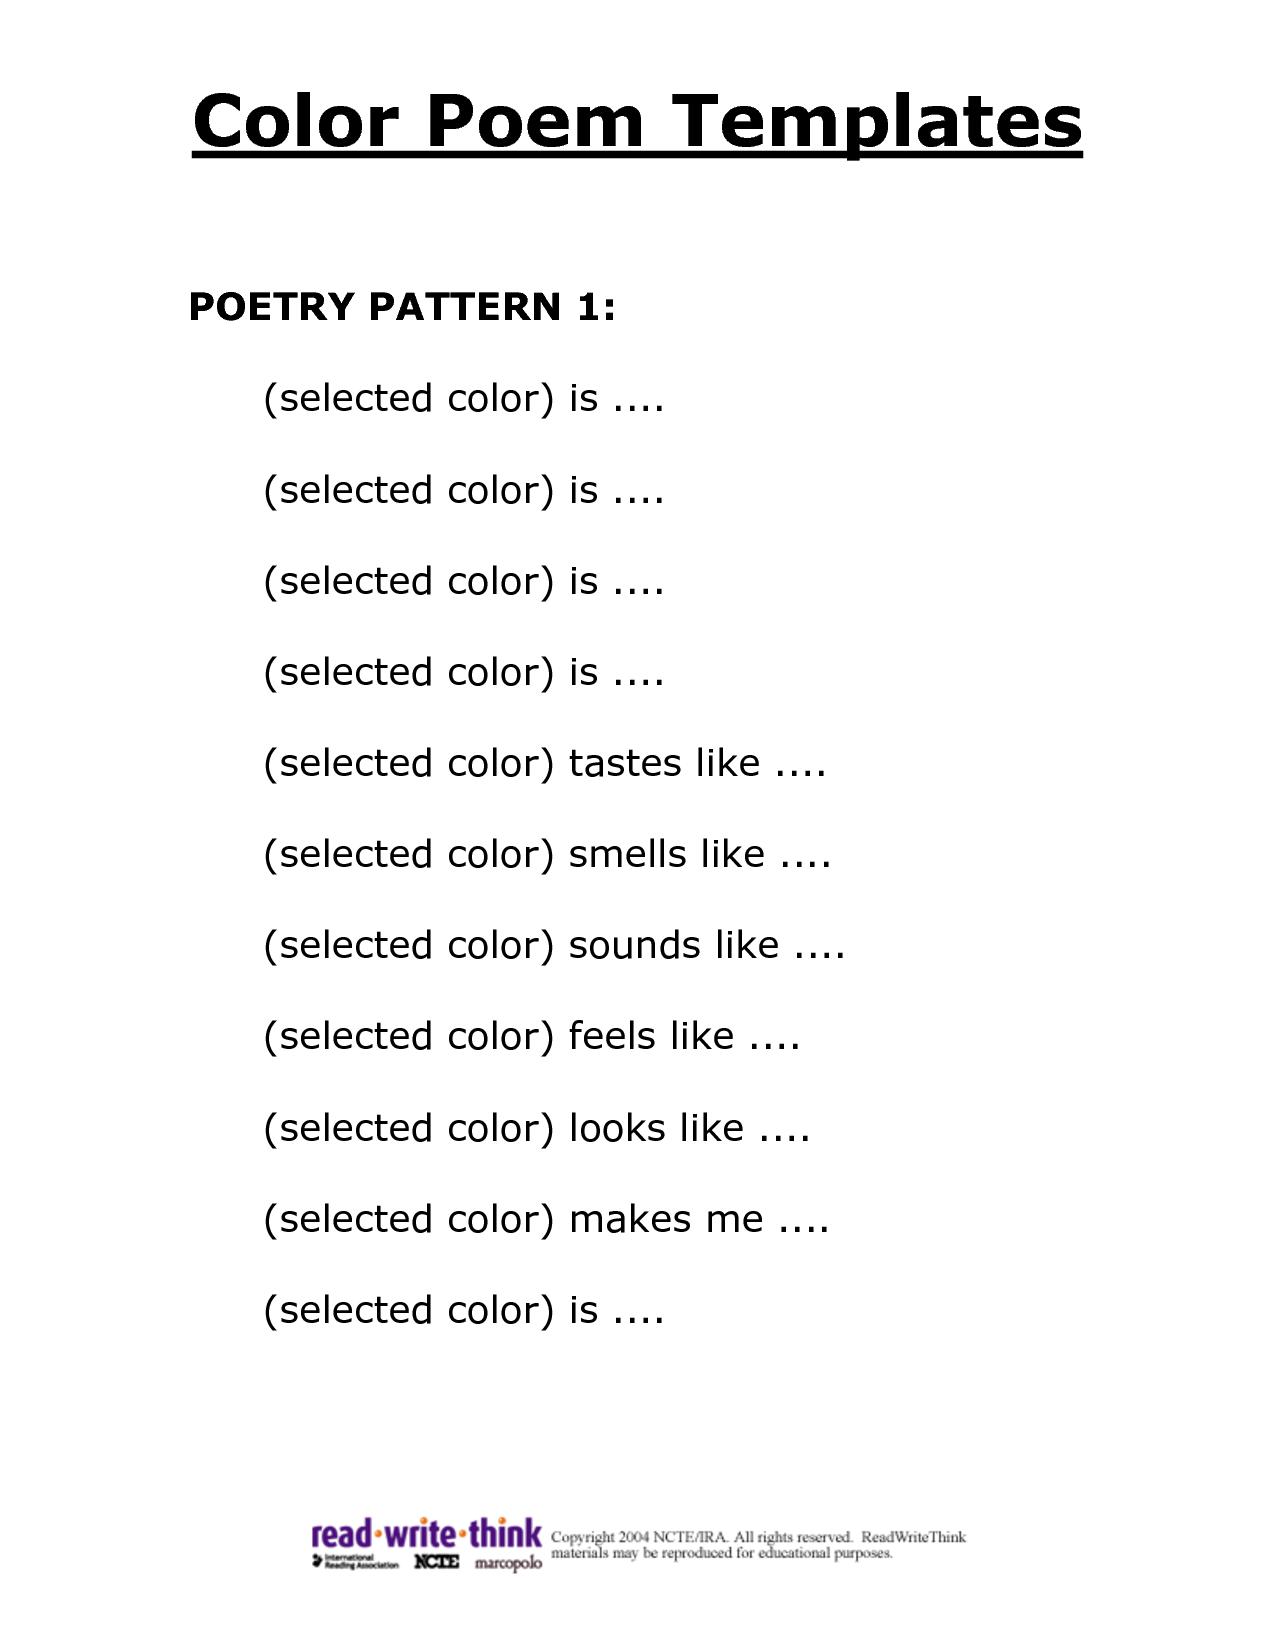 Poem Template N0tzb5hr